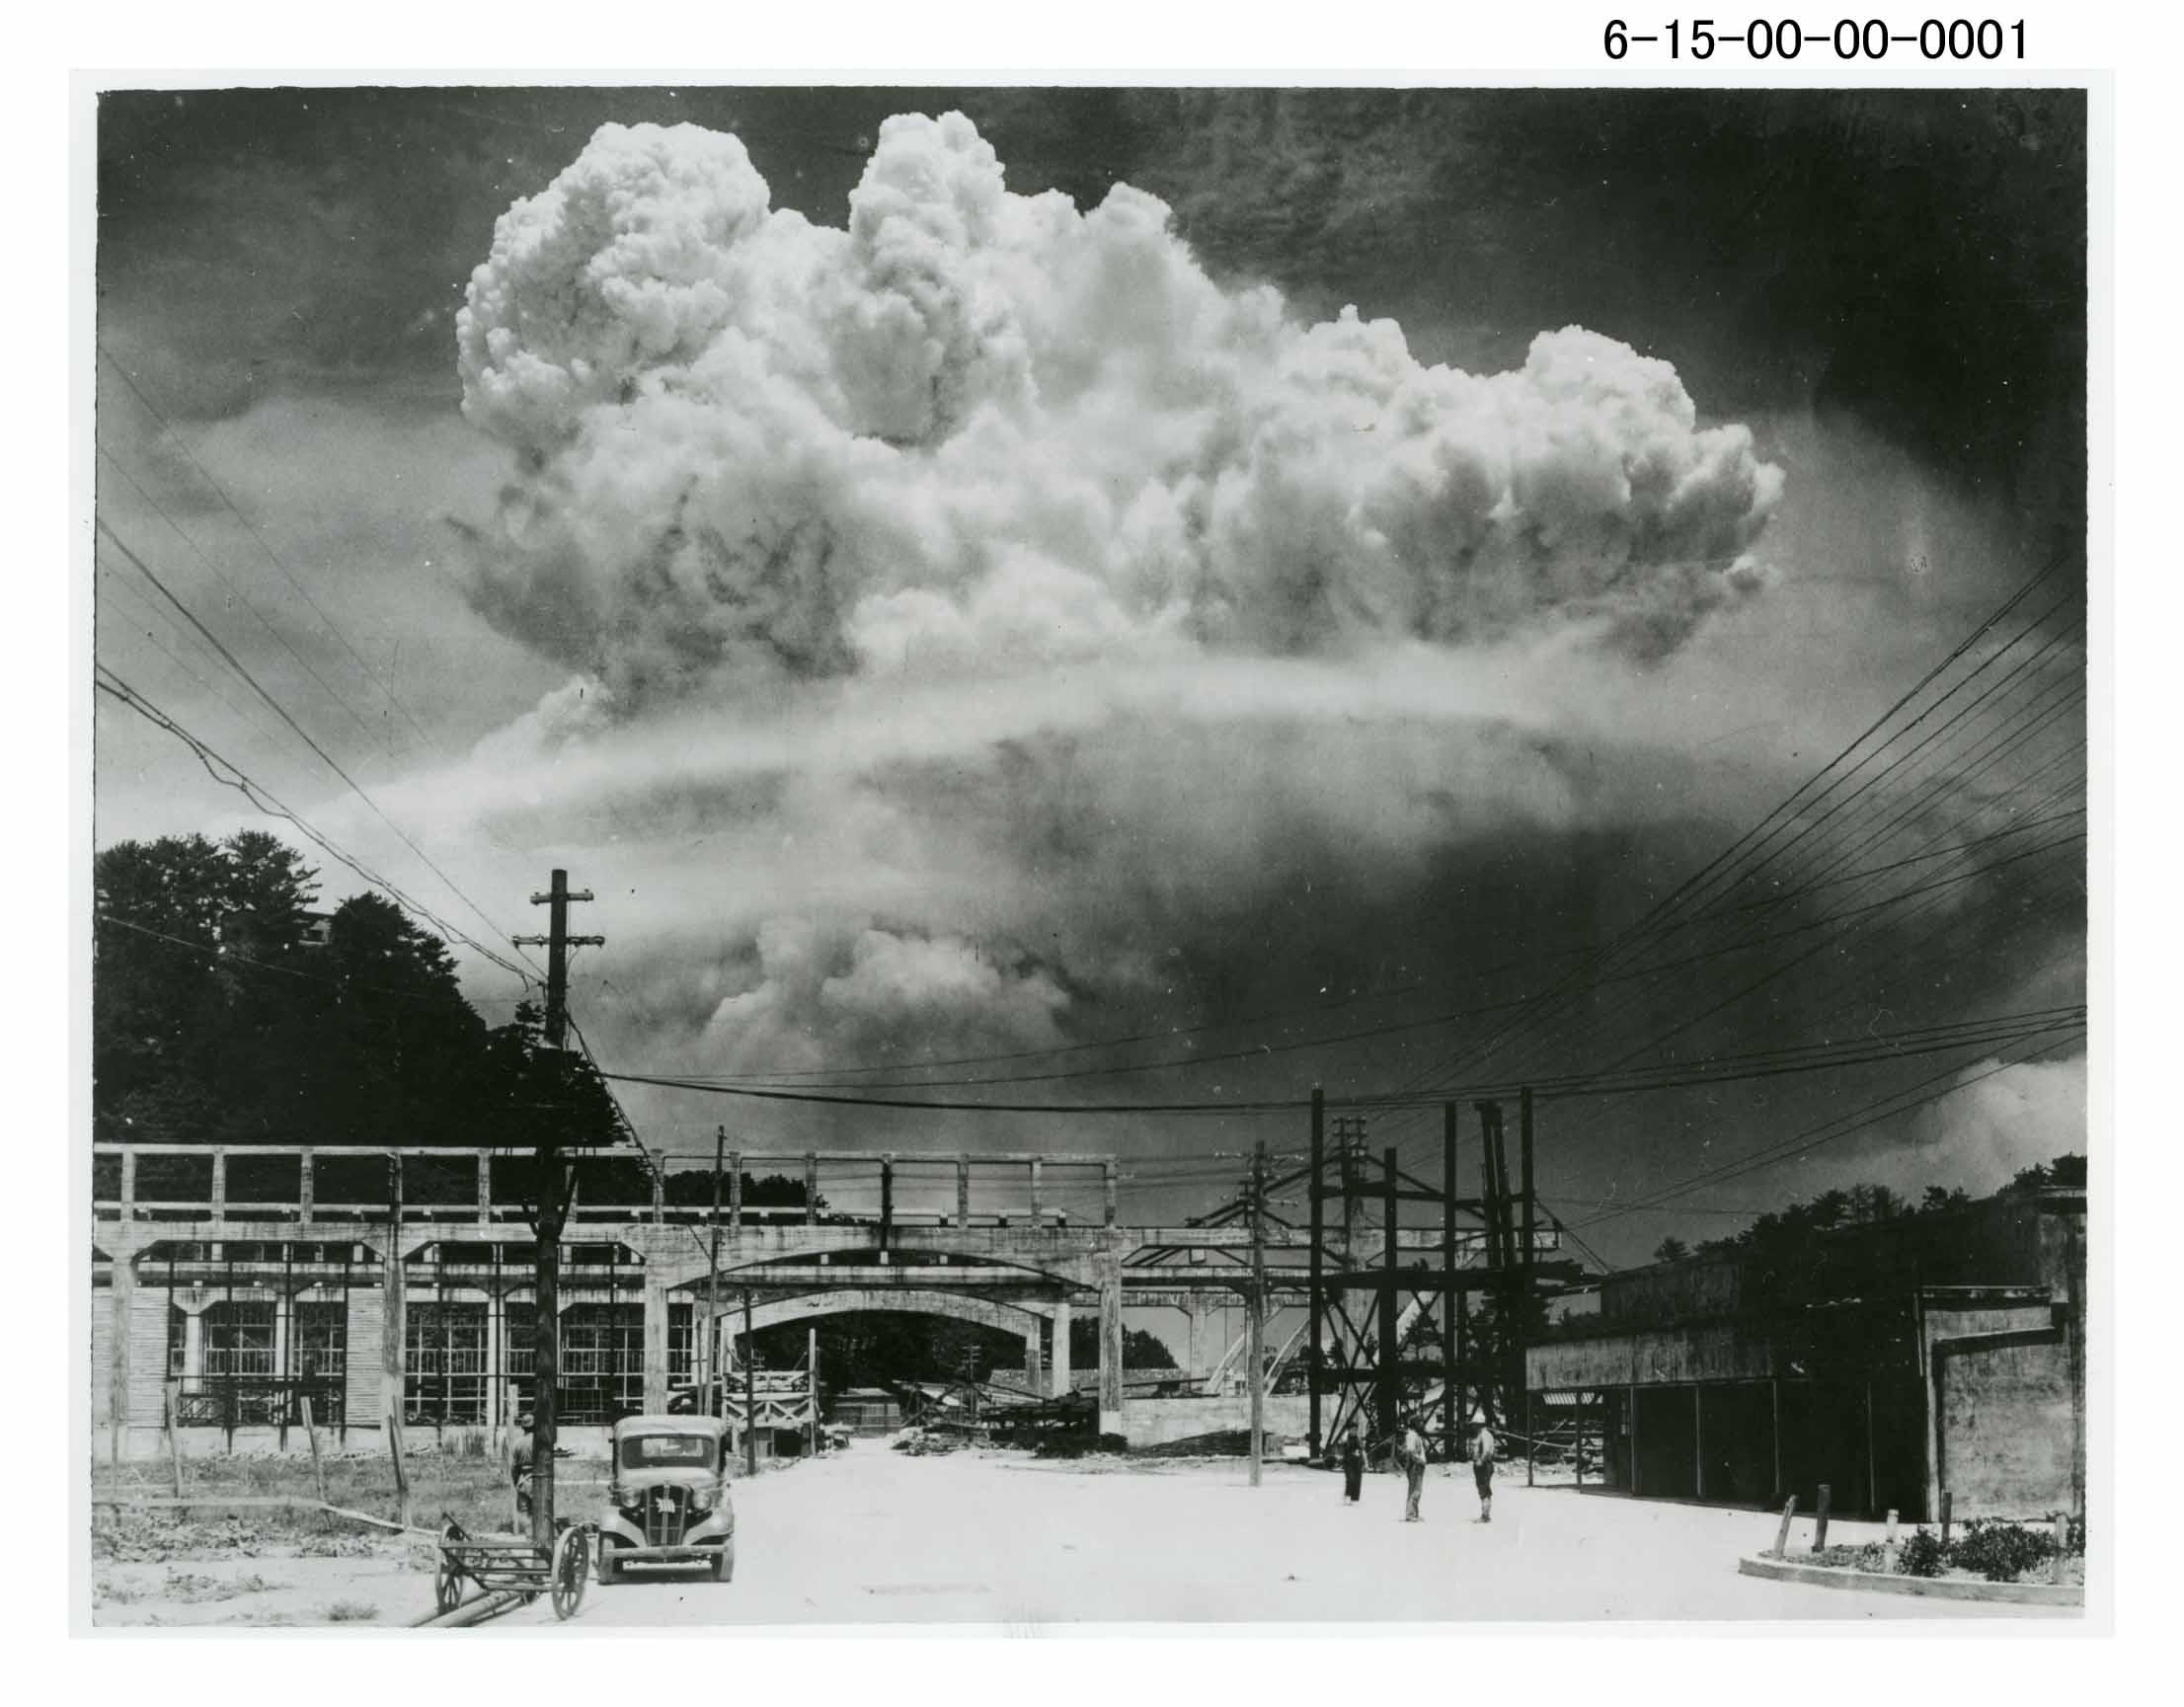 Hiroshima & Nagasaki and the Dawn of the Nuclear Age